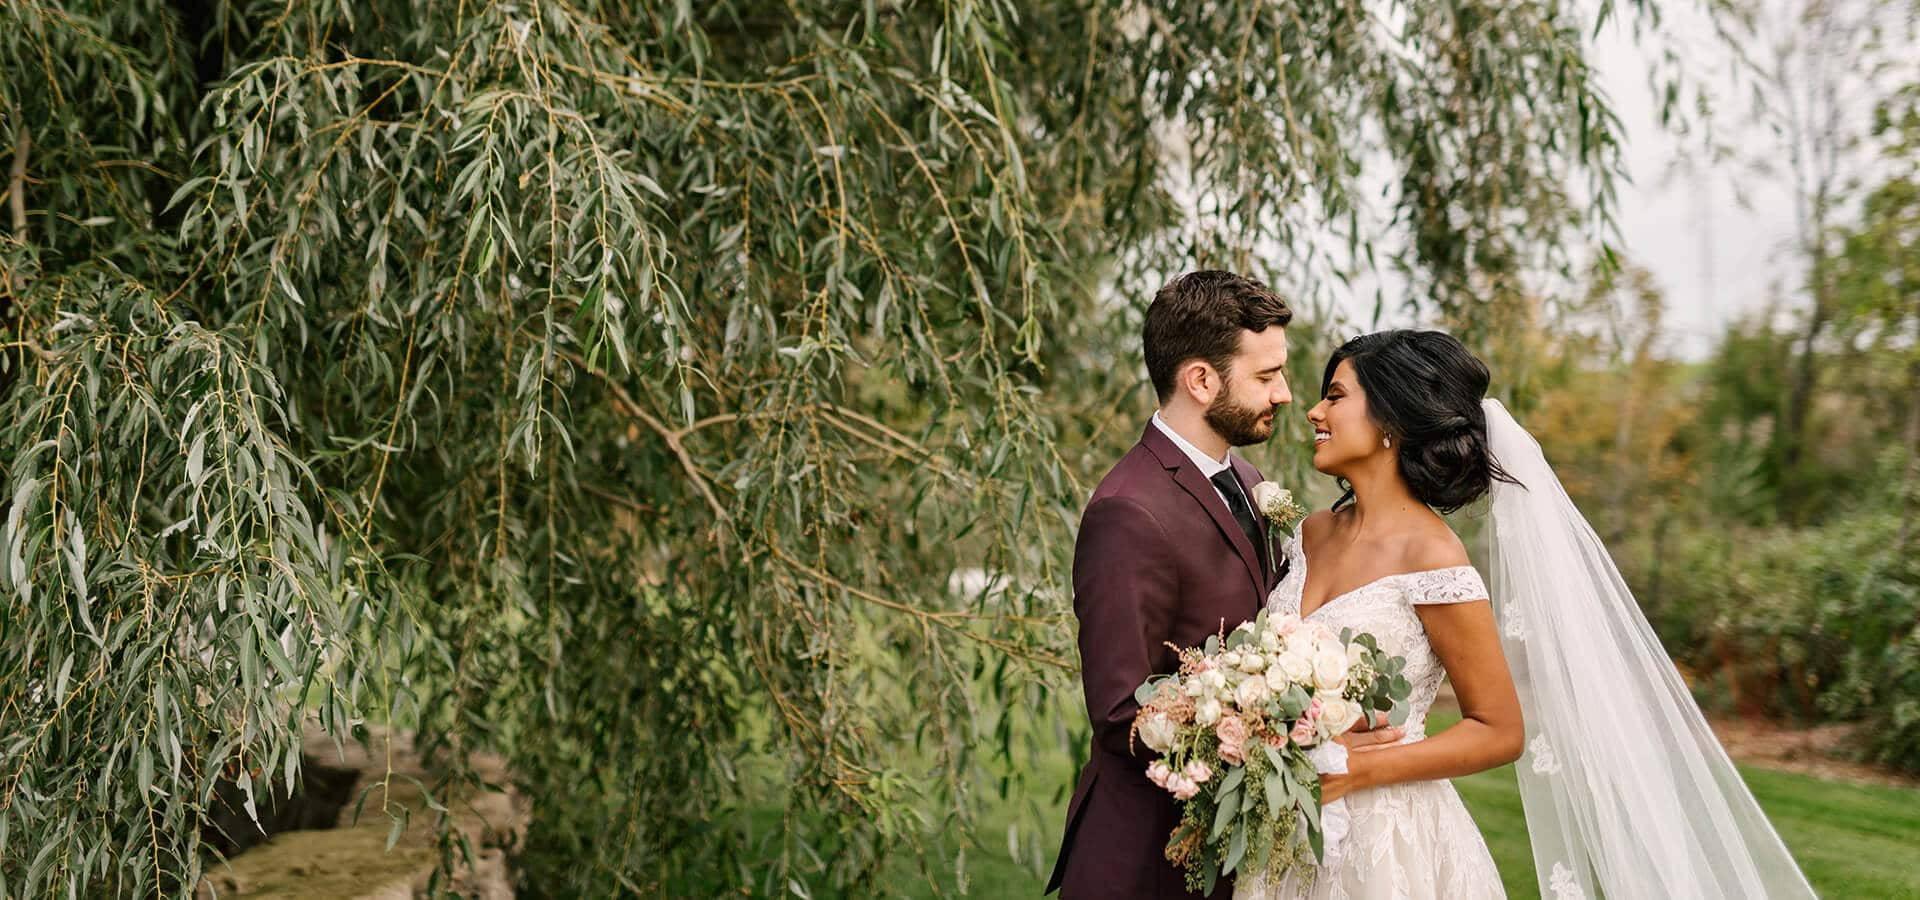 Hero image for Rachel & Mike's Lush Garden Wedding at the Arlington Estate